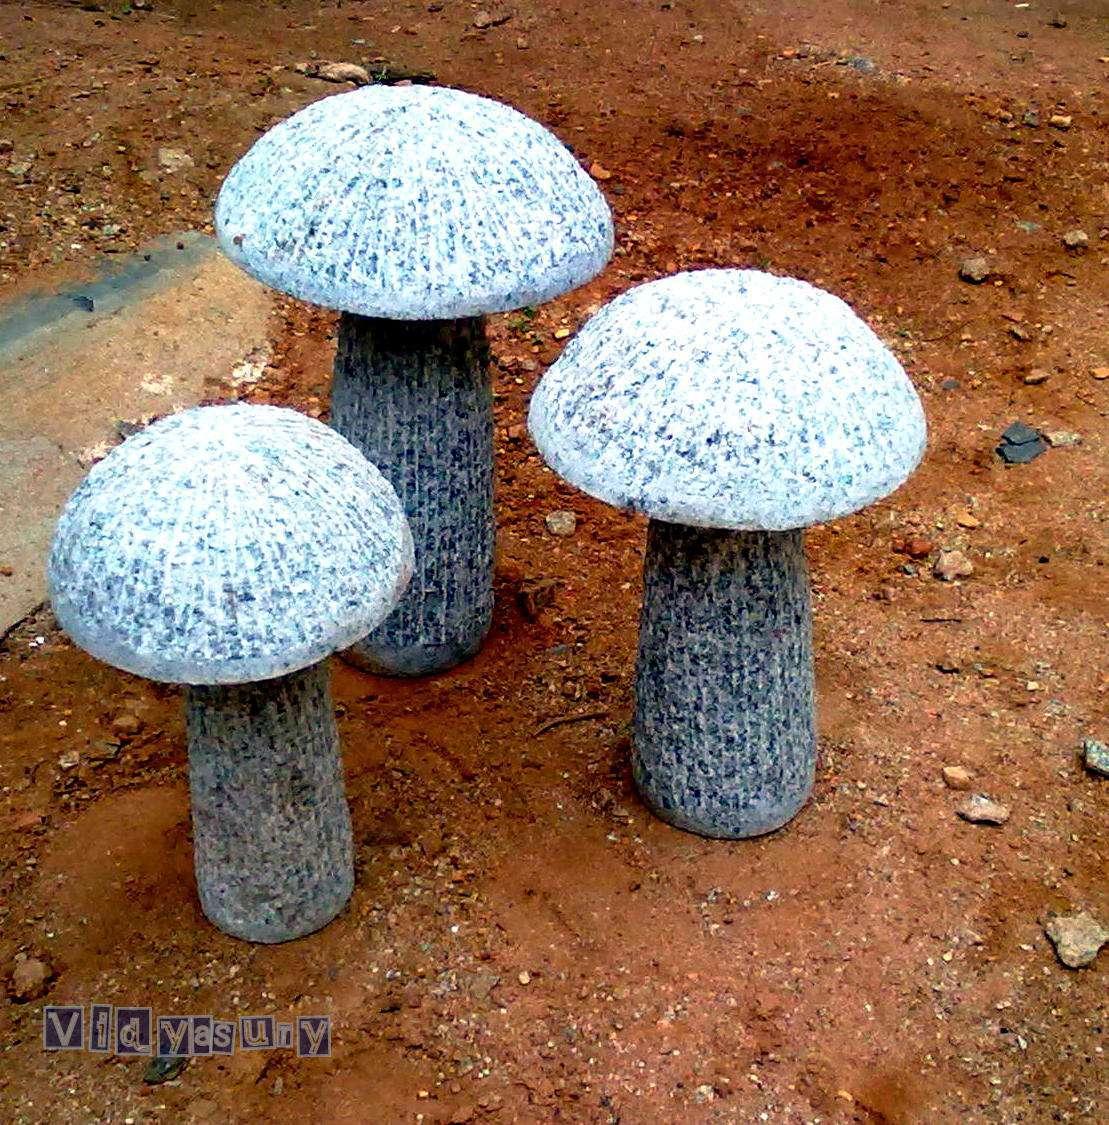 Present Moment Vidya Sury mushrooms